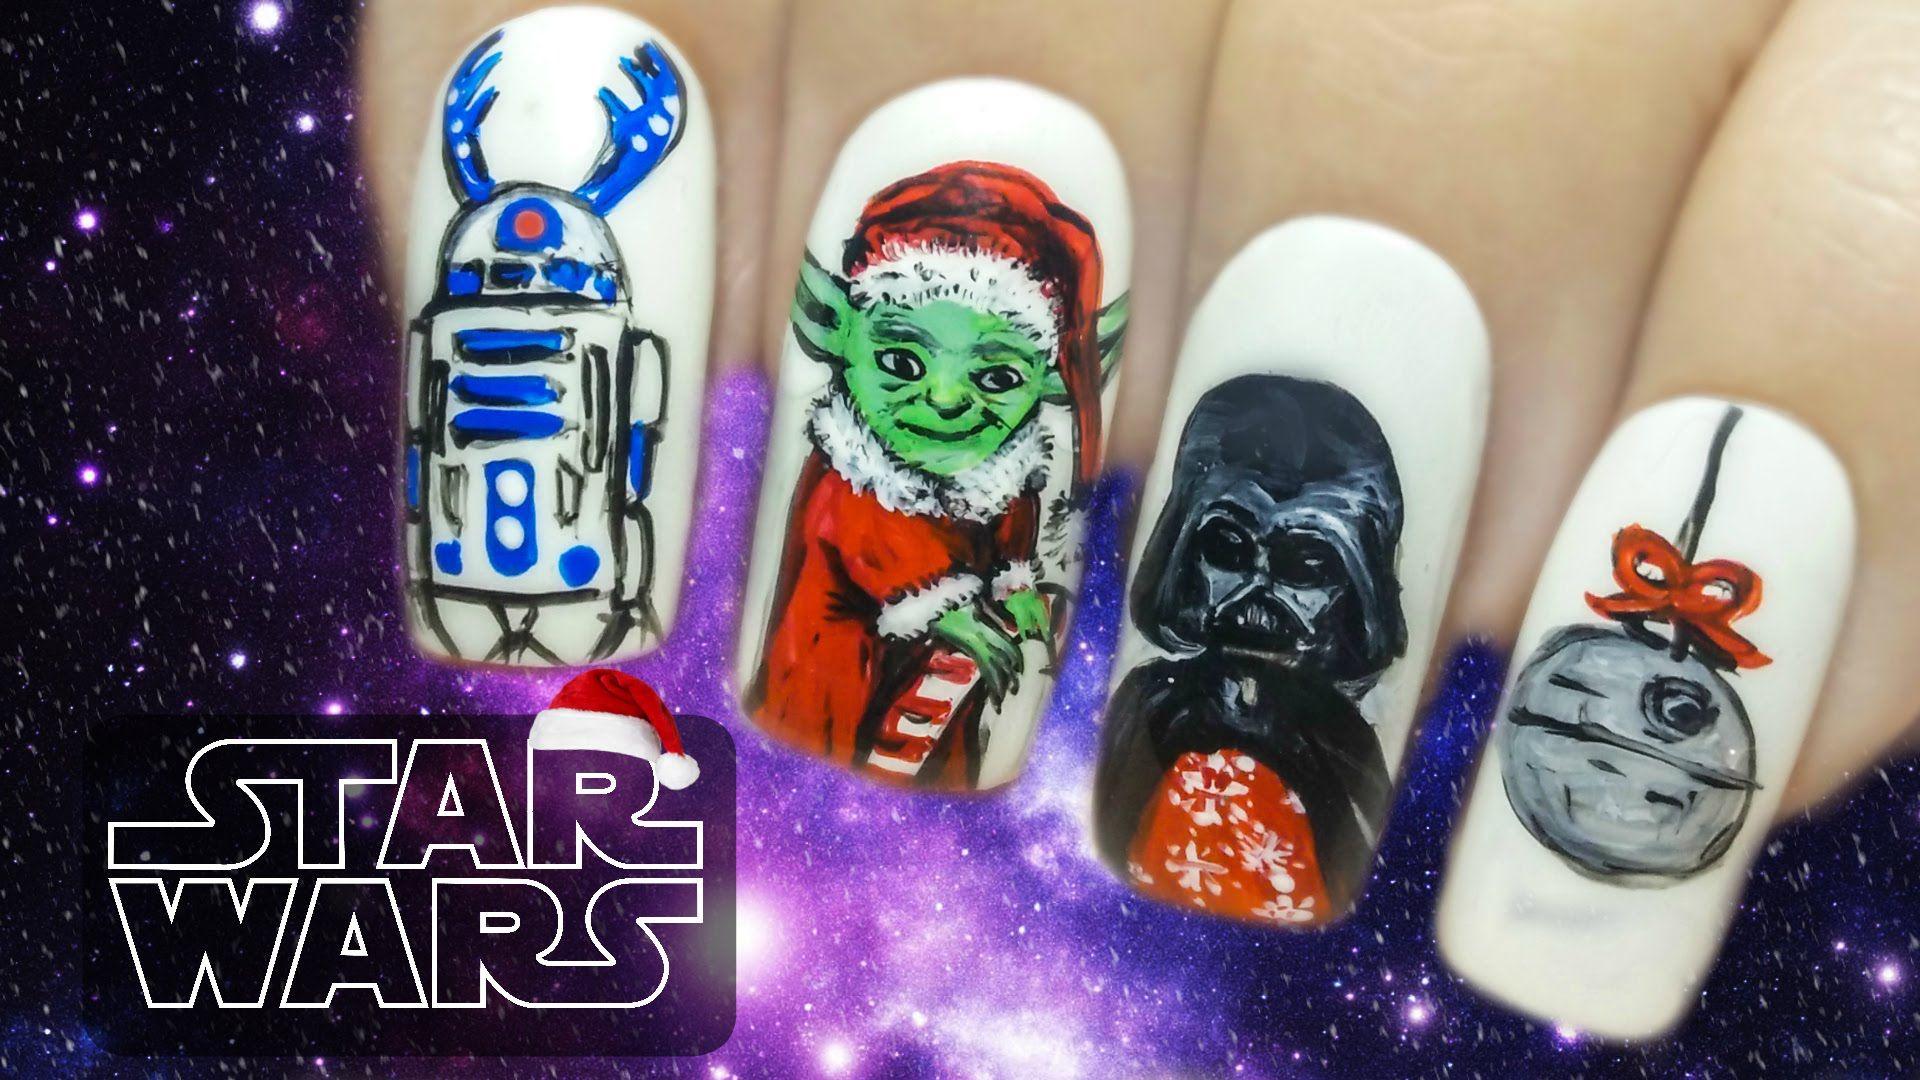 Star Wars on Christmas ⎮ Yoda as Santa ⎮ Freehand Nail Art Tutorial